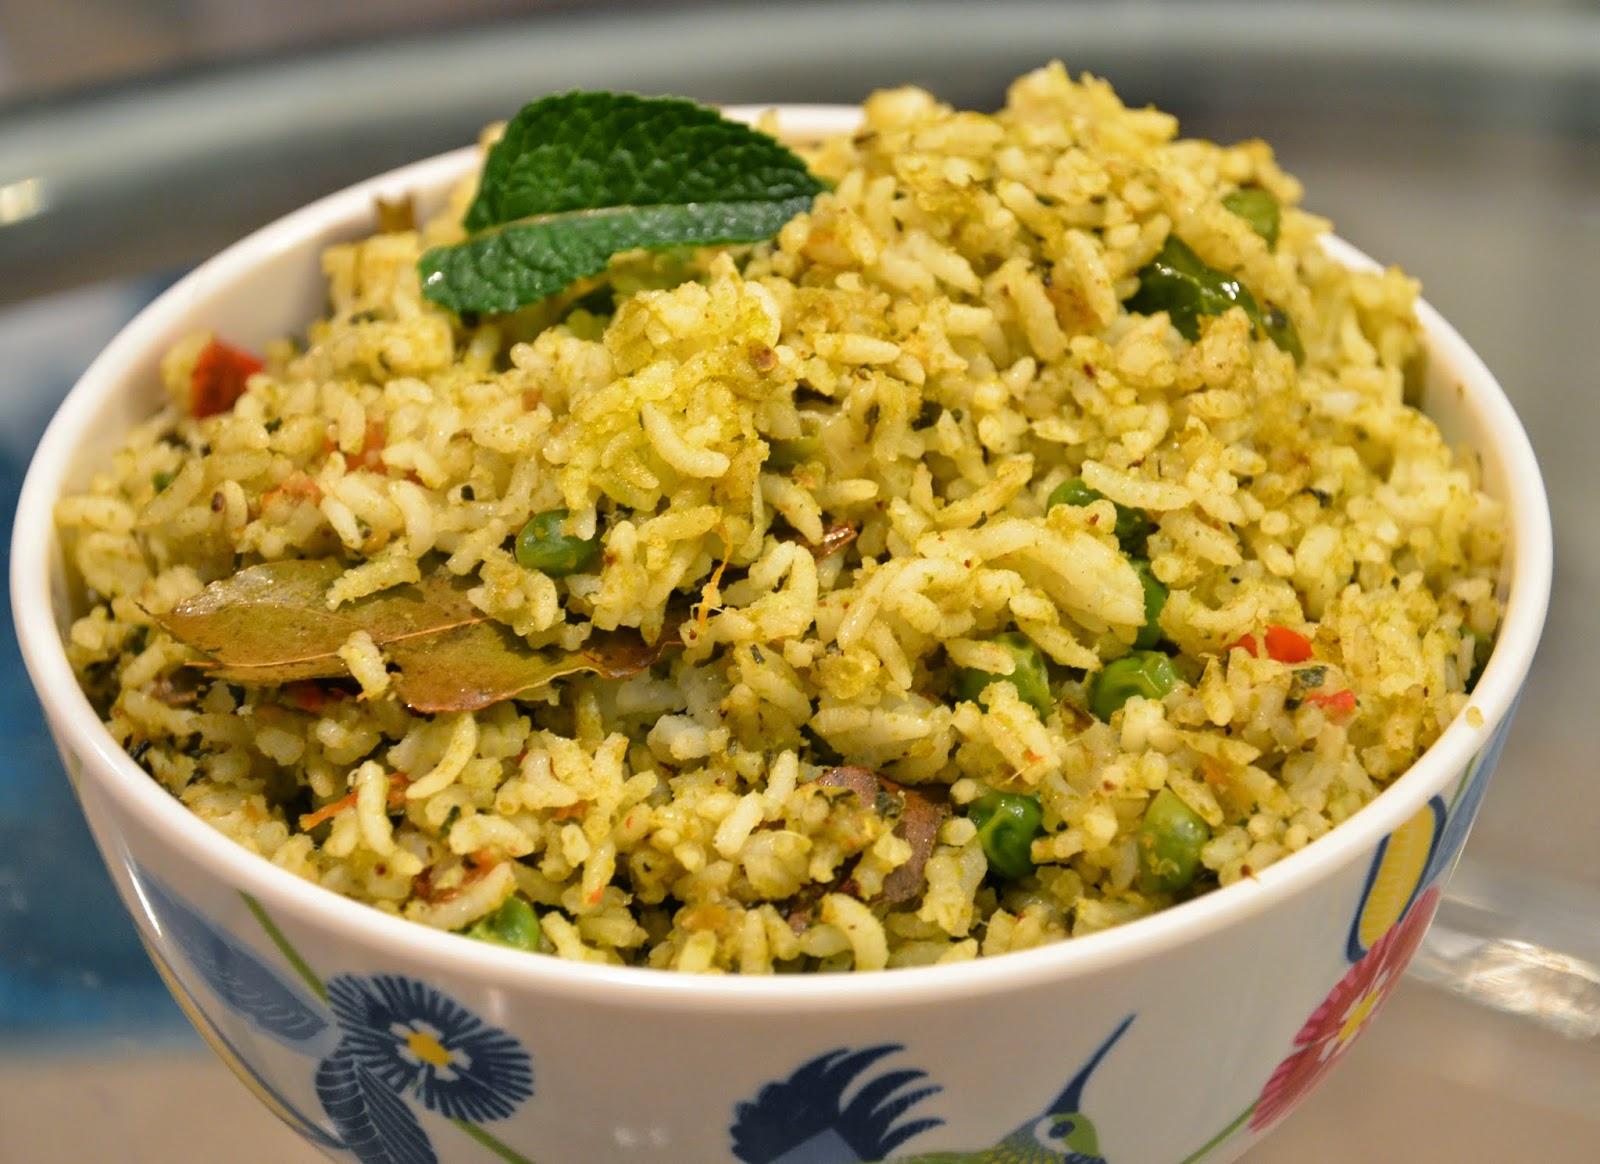 menthya bhath, mentya bath, quick lunch box recipe, lunch box rice vareity